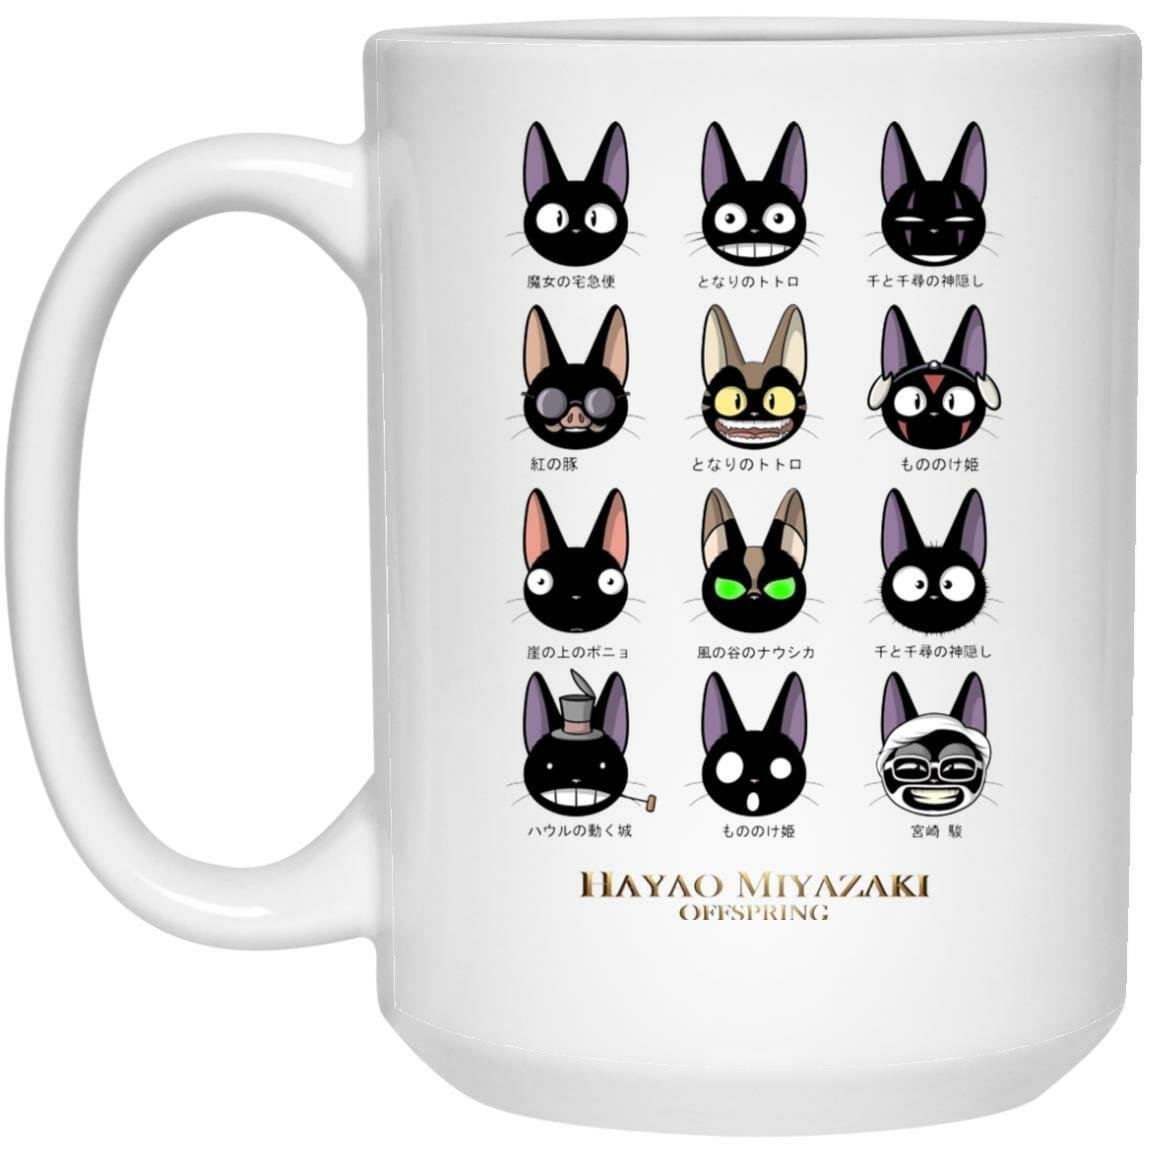 Jiji Hayao Miyazaki Off Spring Mug